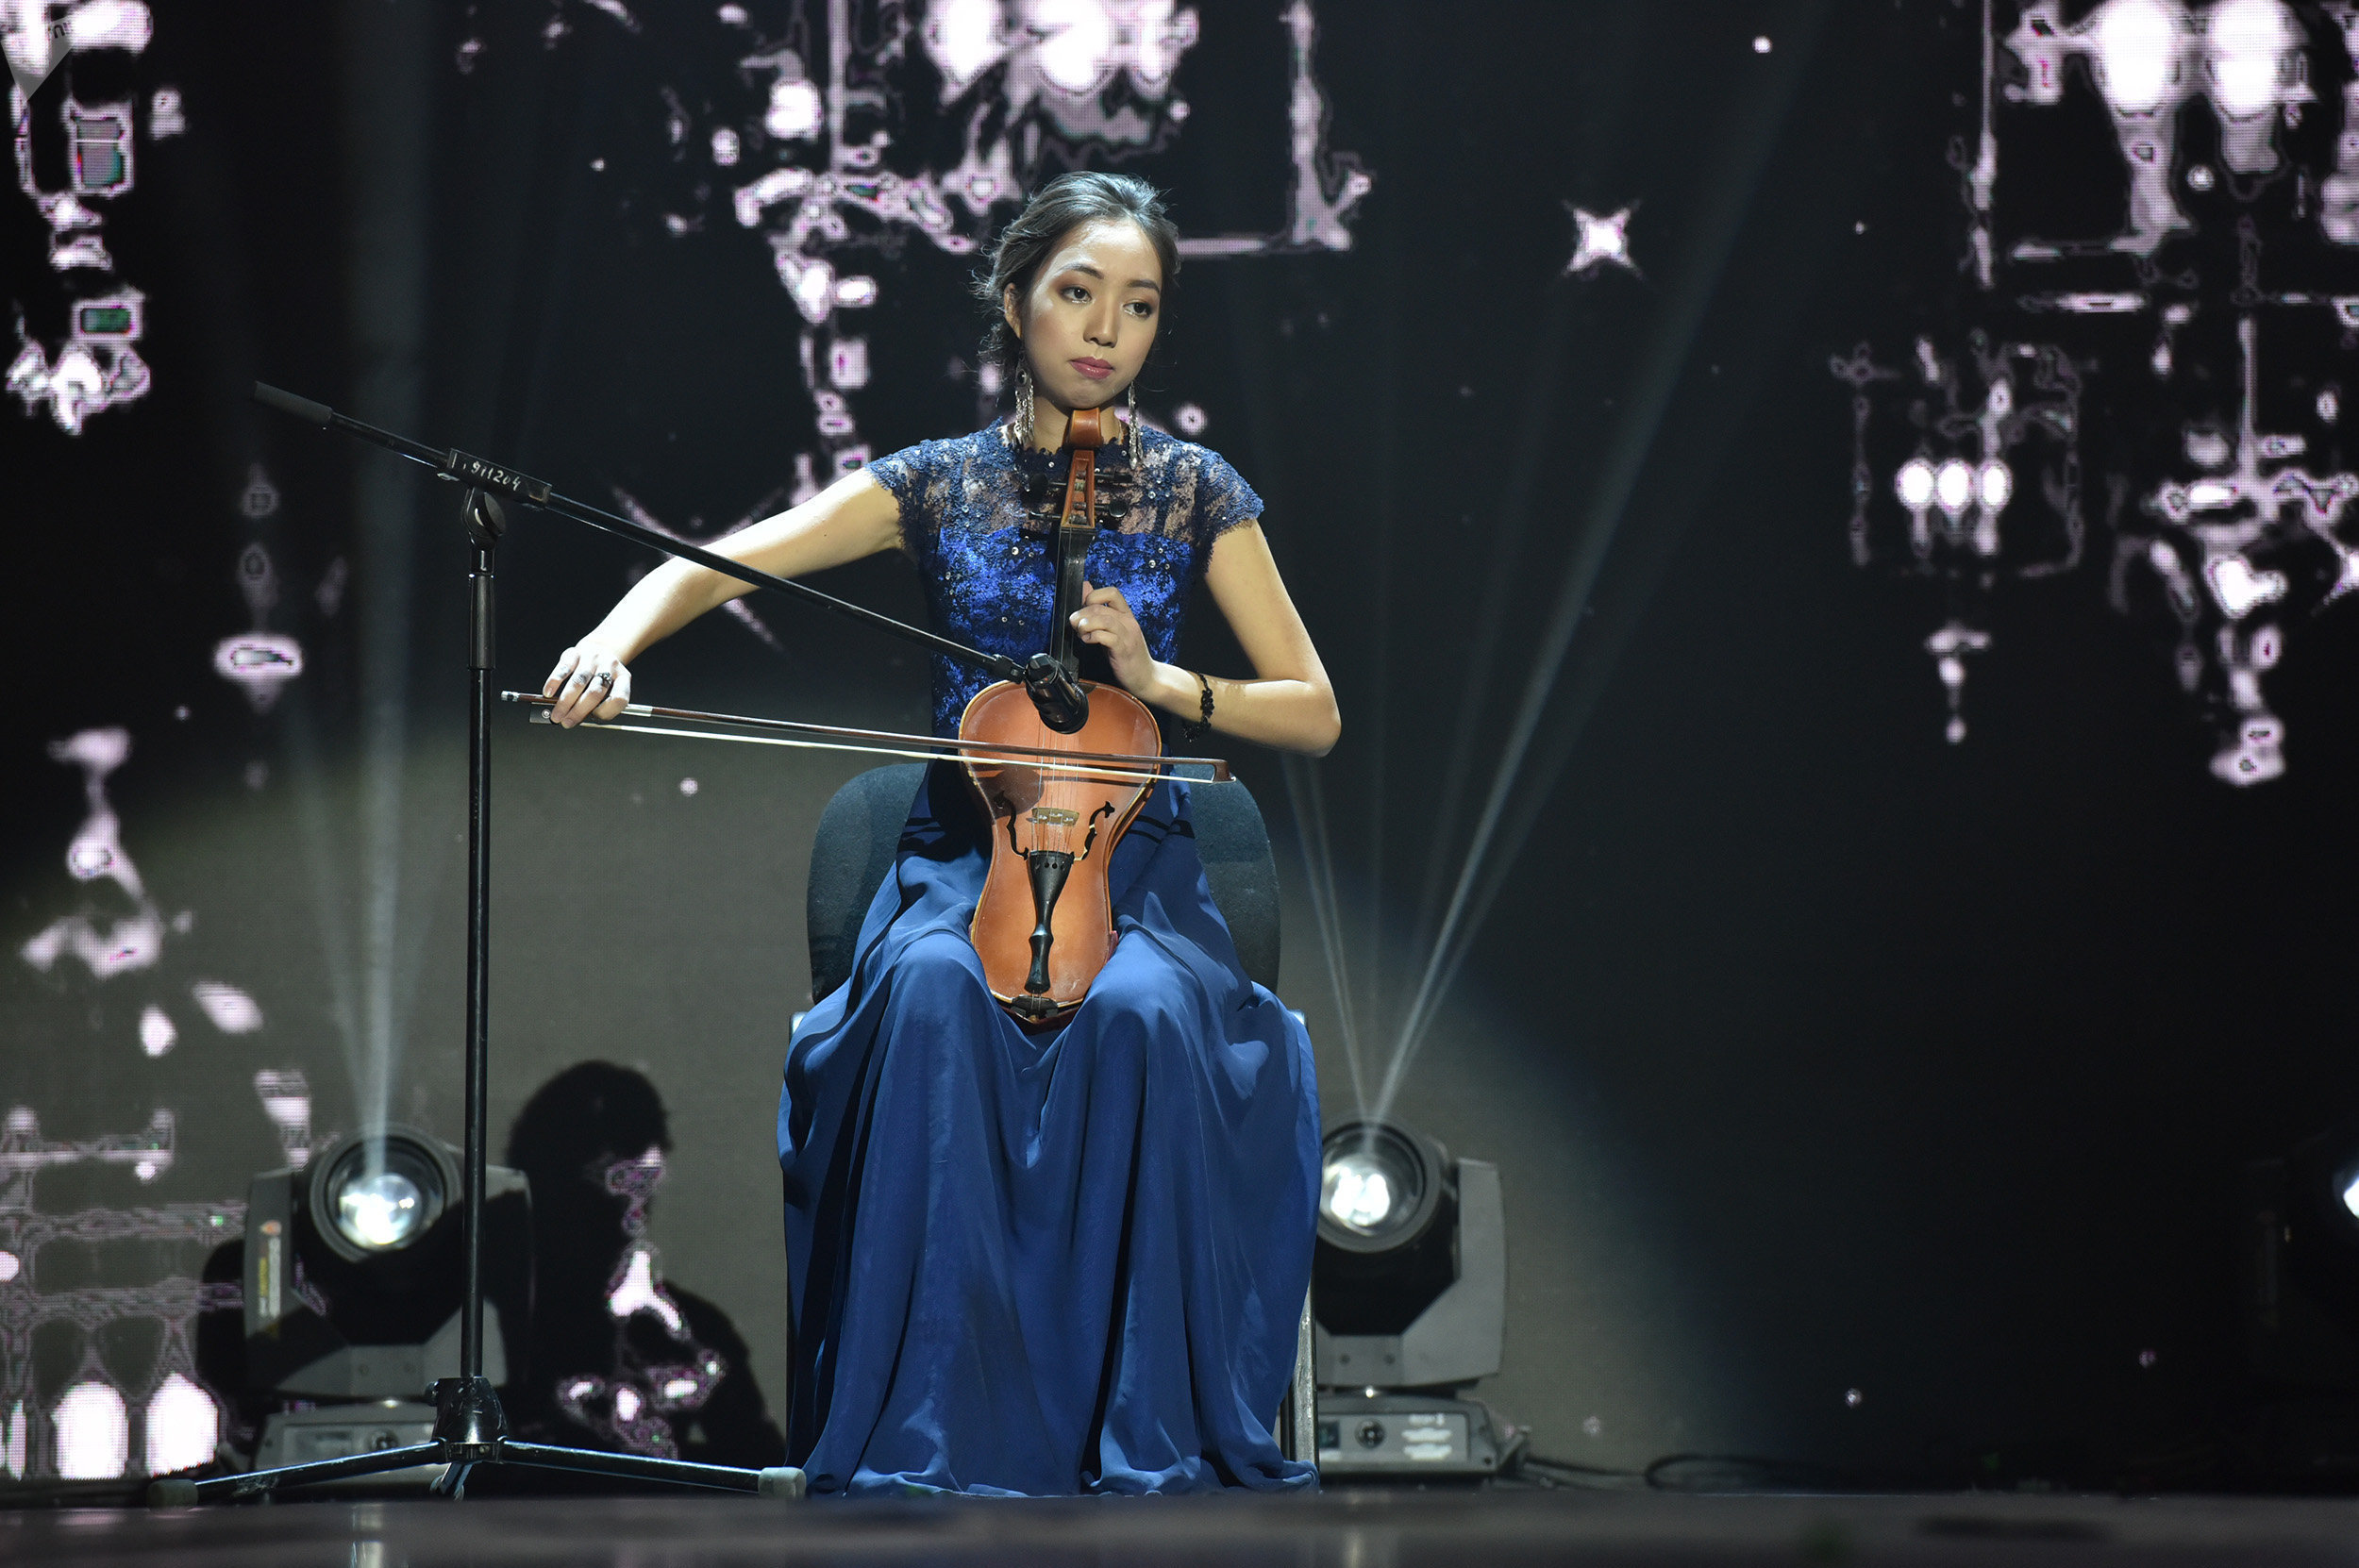 Айым Мейірханова, Шабыт-2018  қатысушысы